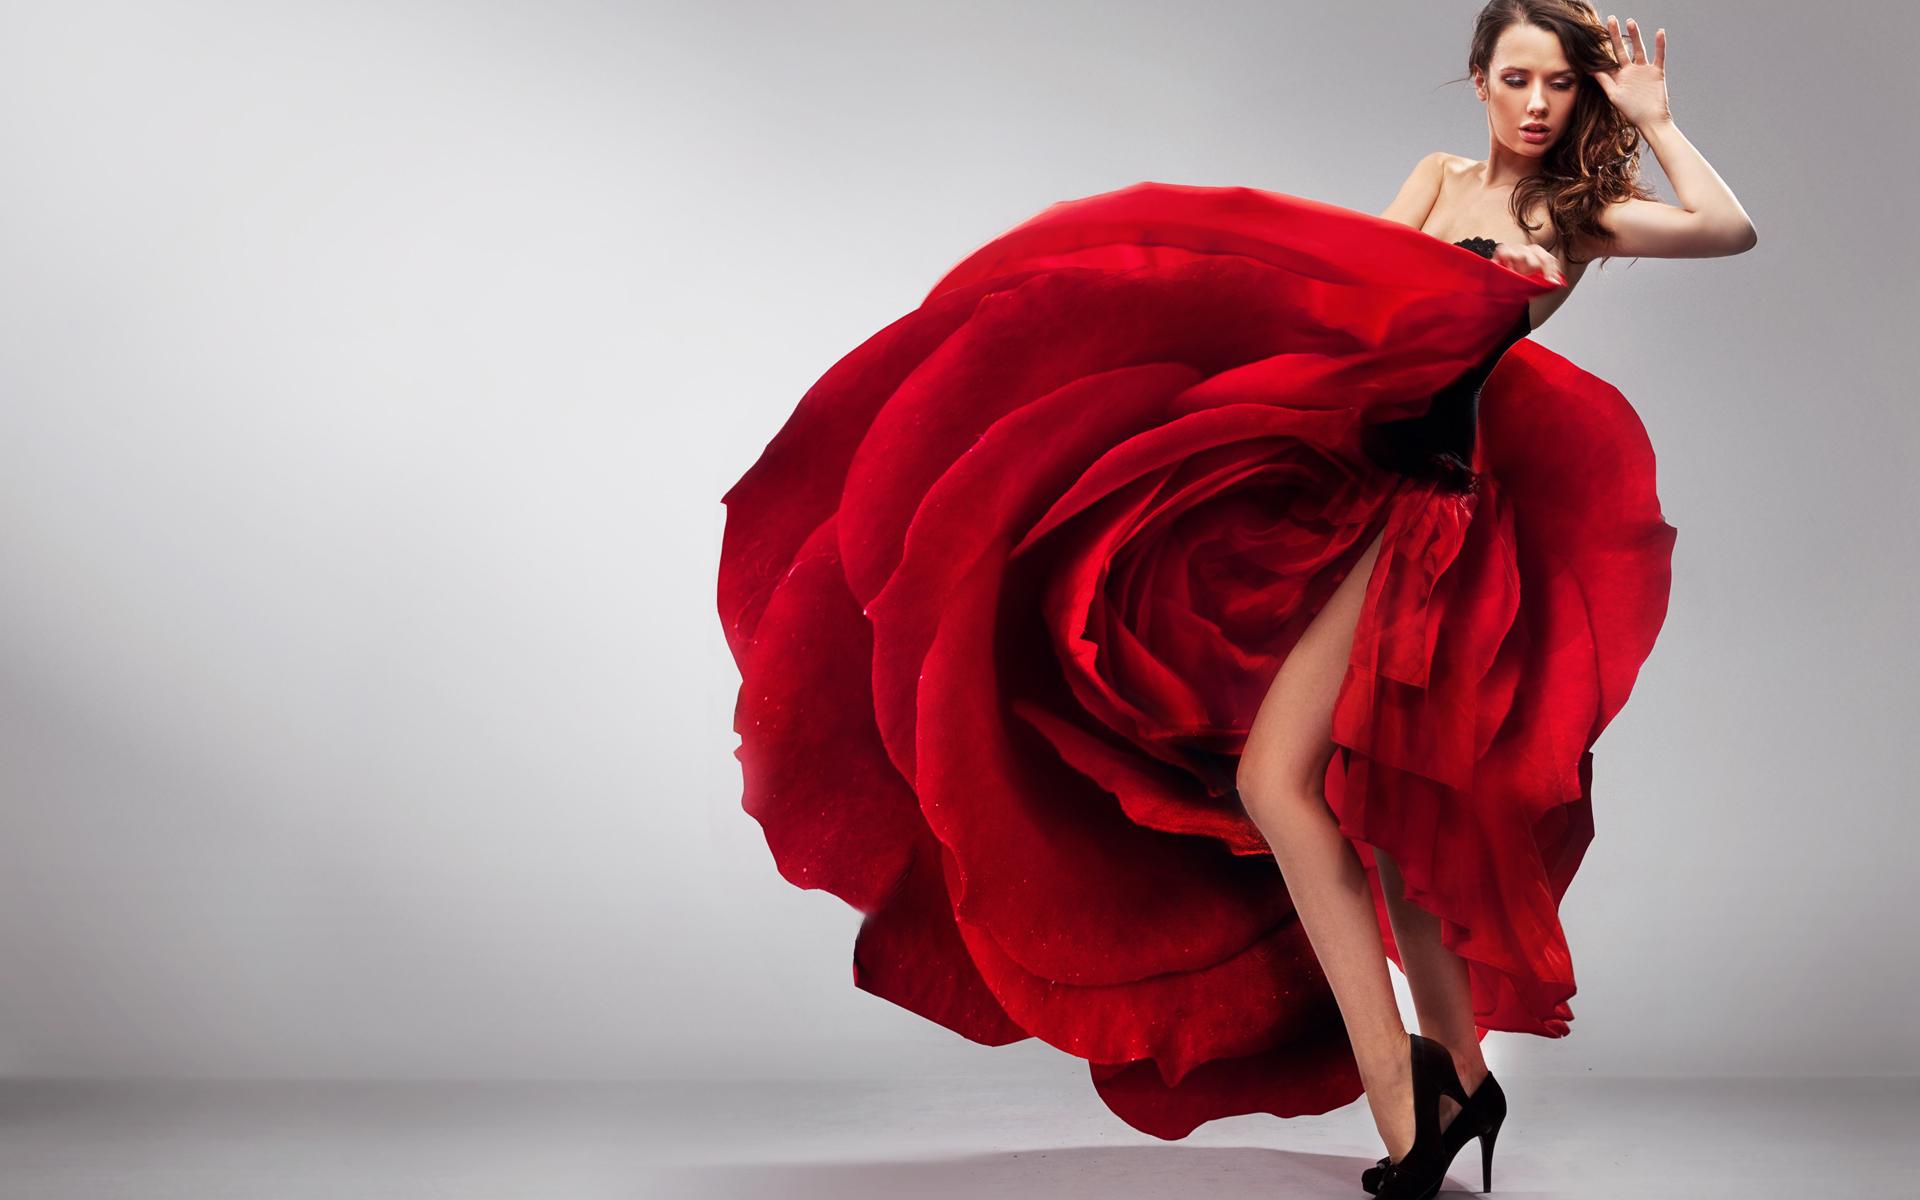 Dress Wallpaper 35577 1920x1200 px